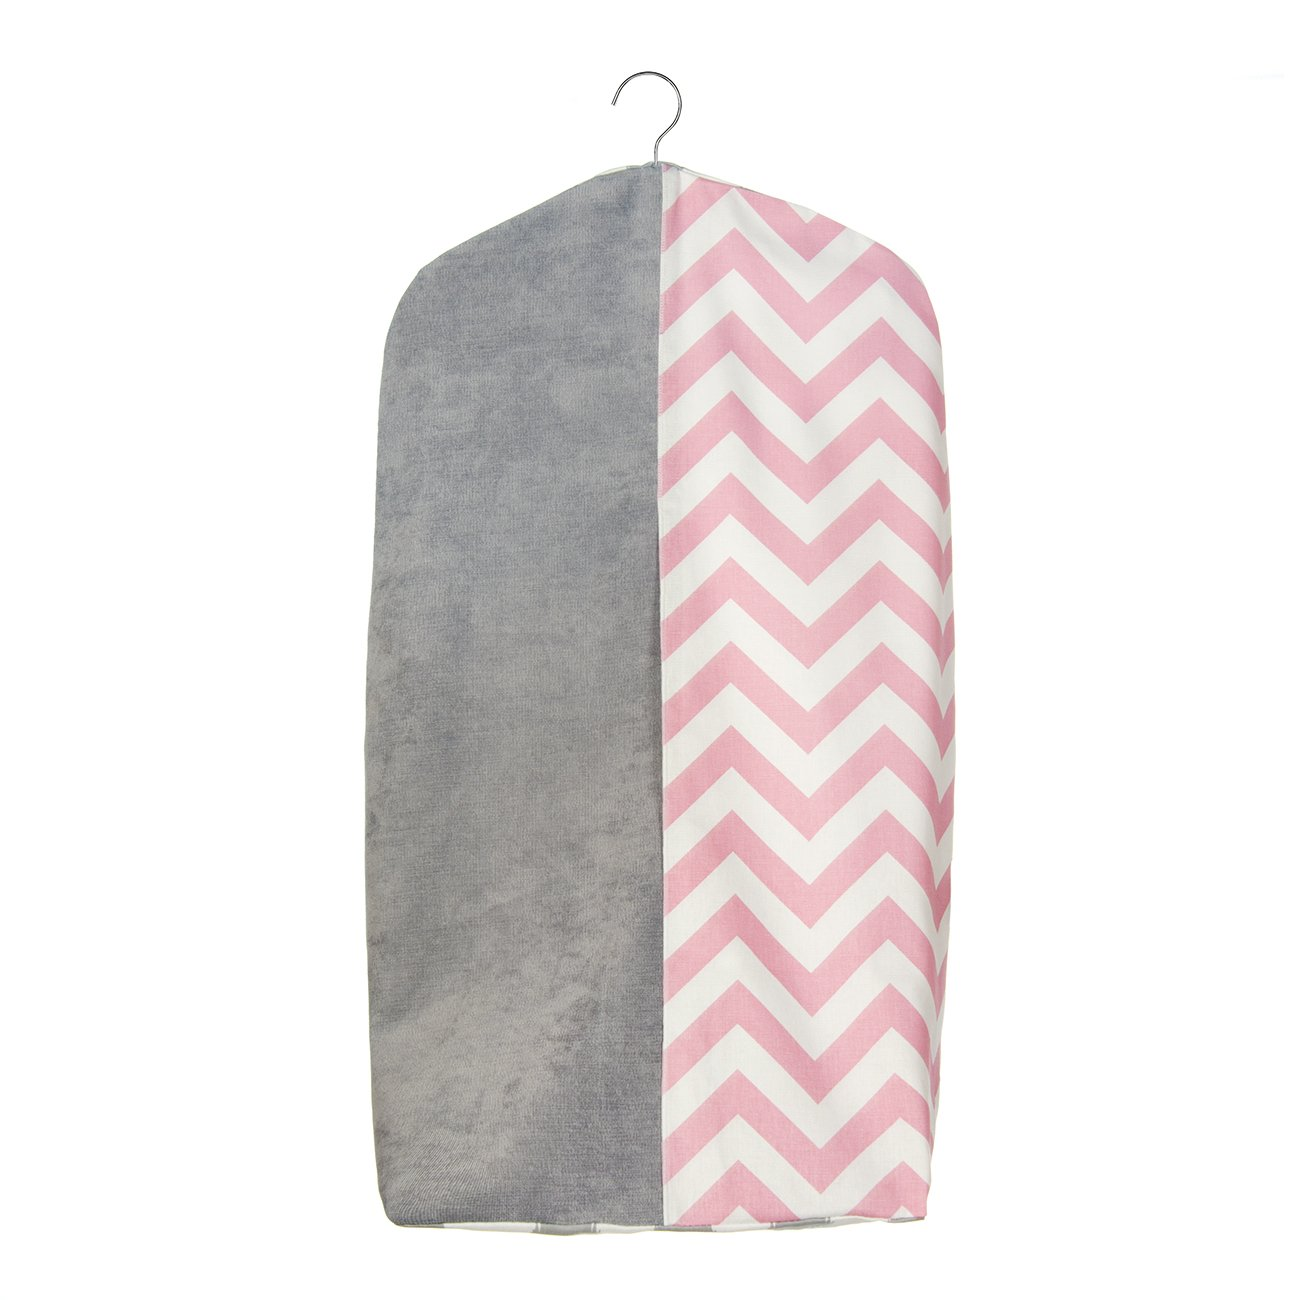 Layered Crib Diaper Stacker in Pink